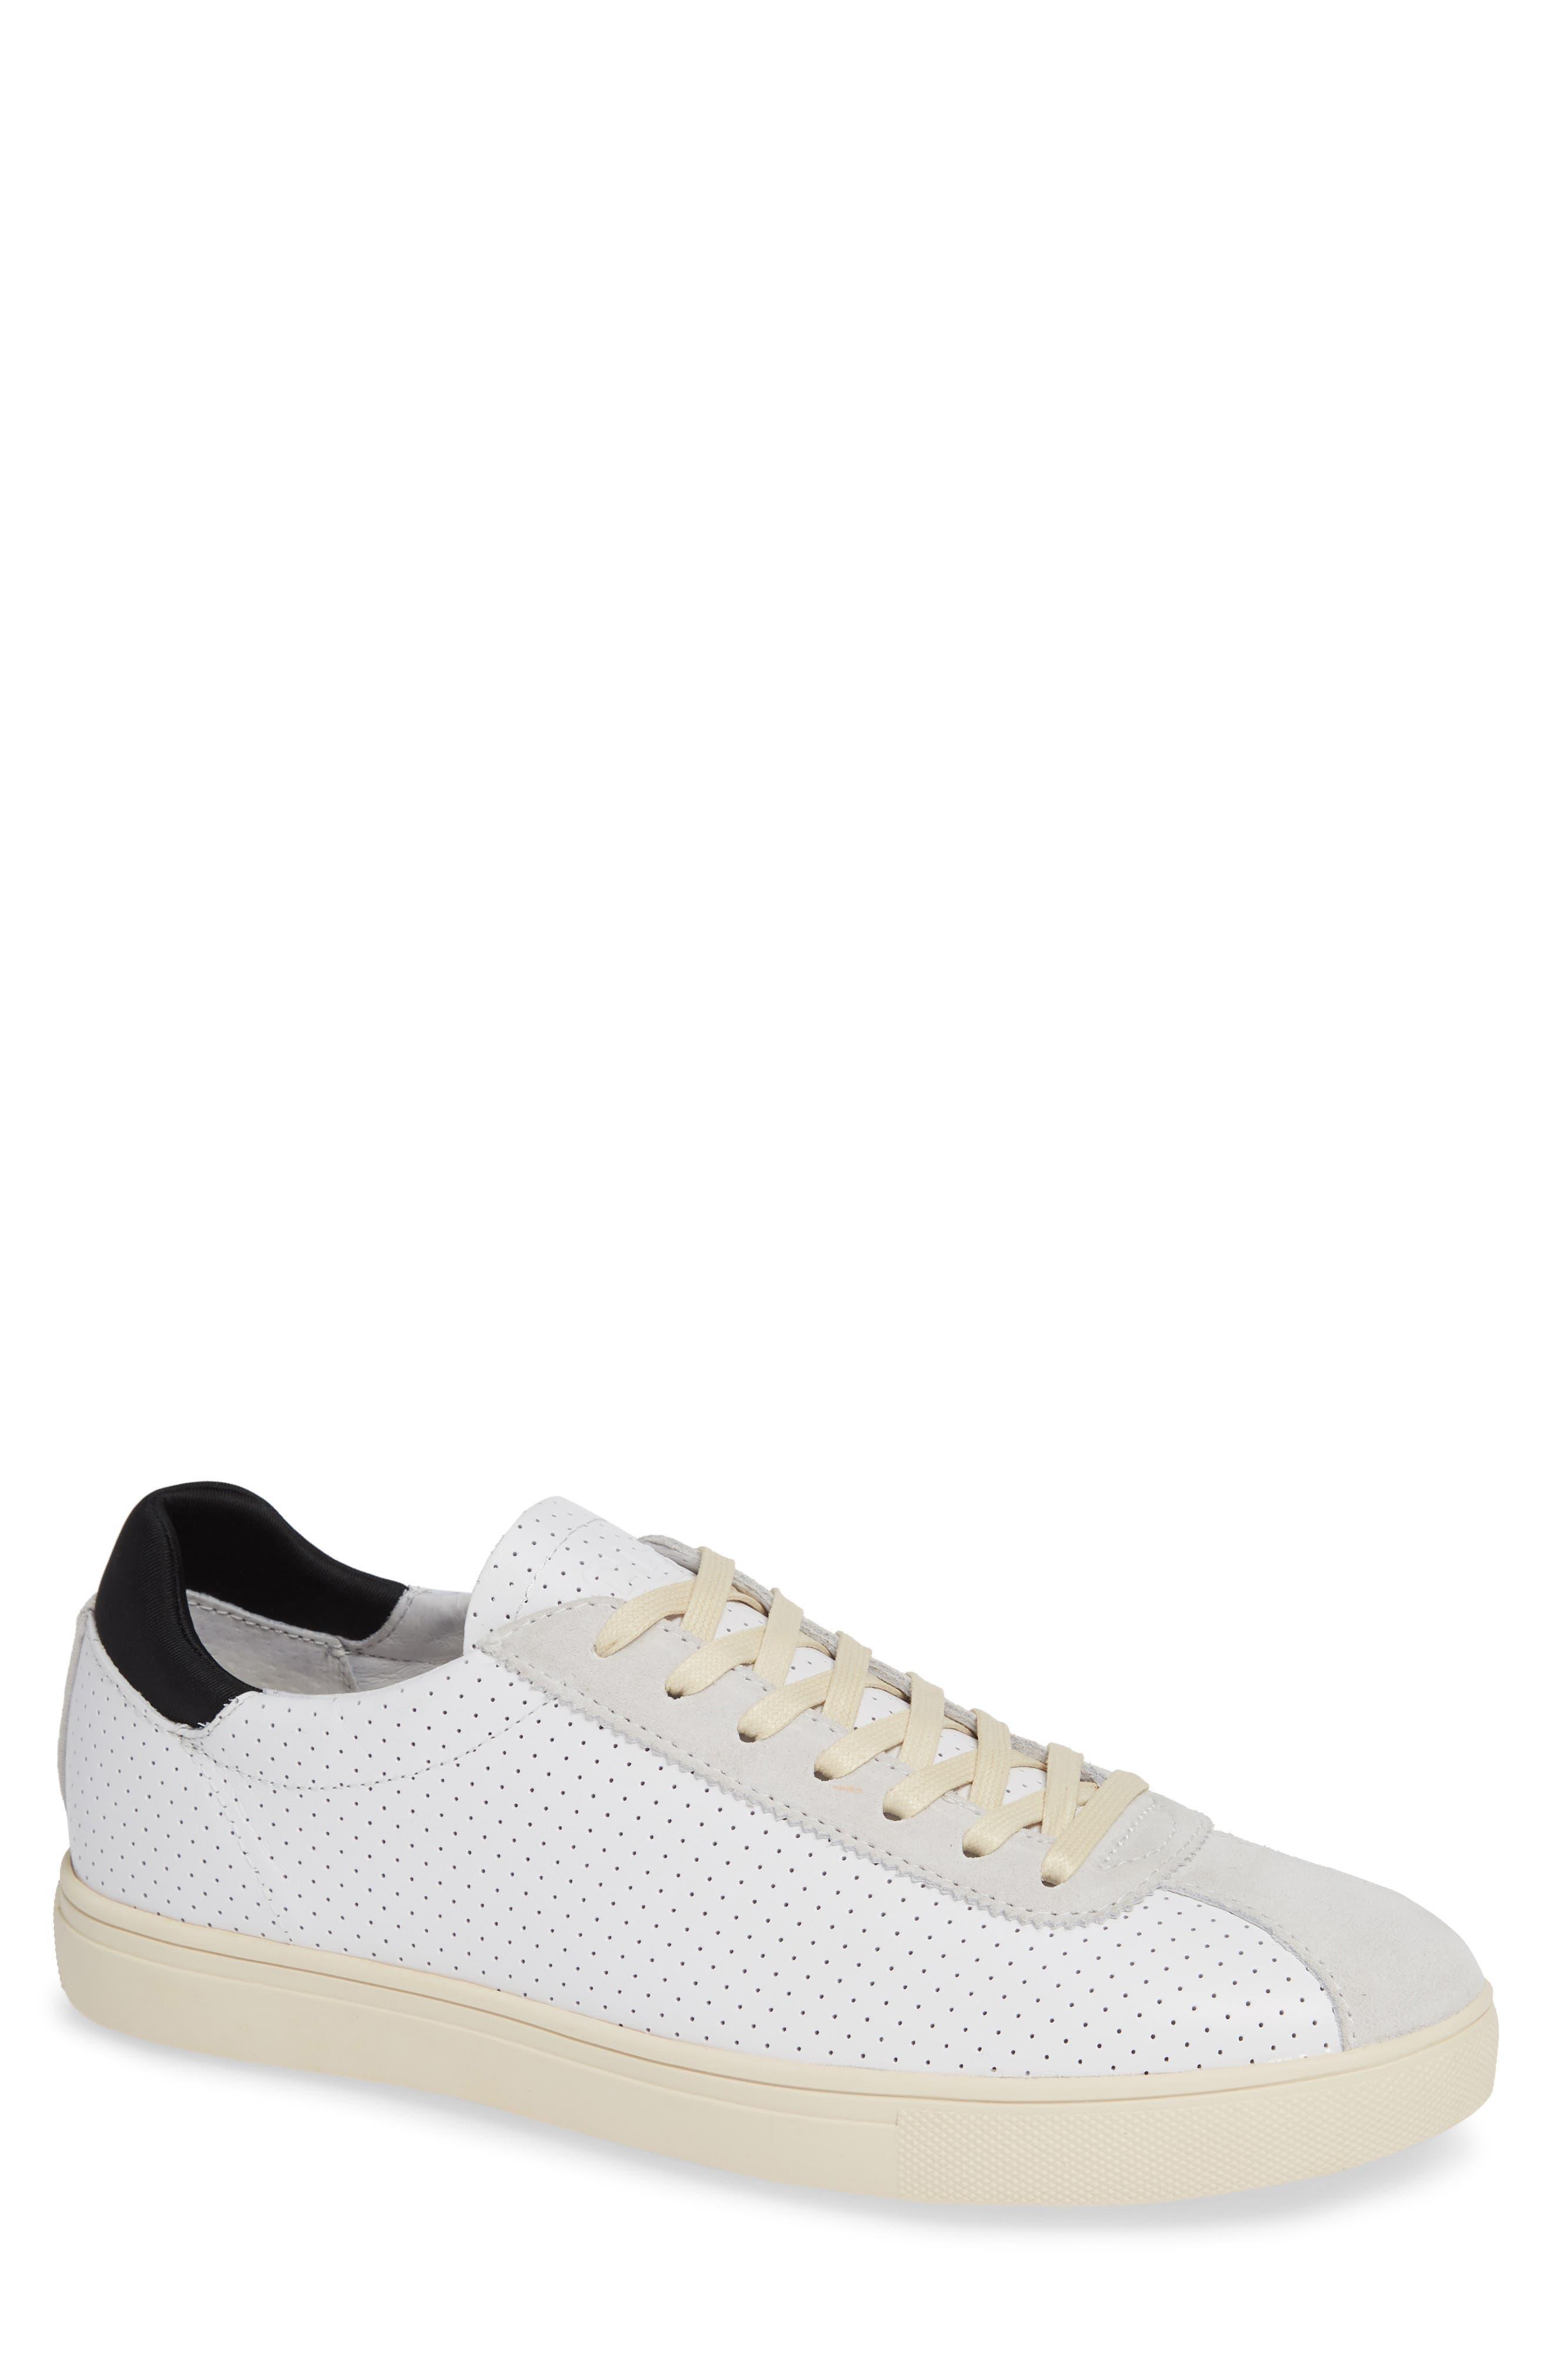 Noah Sneaker,                             Main thumbnail 1, color,                             WHITE LEATHER SUEDE CREAM